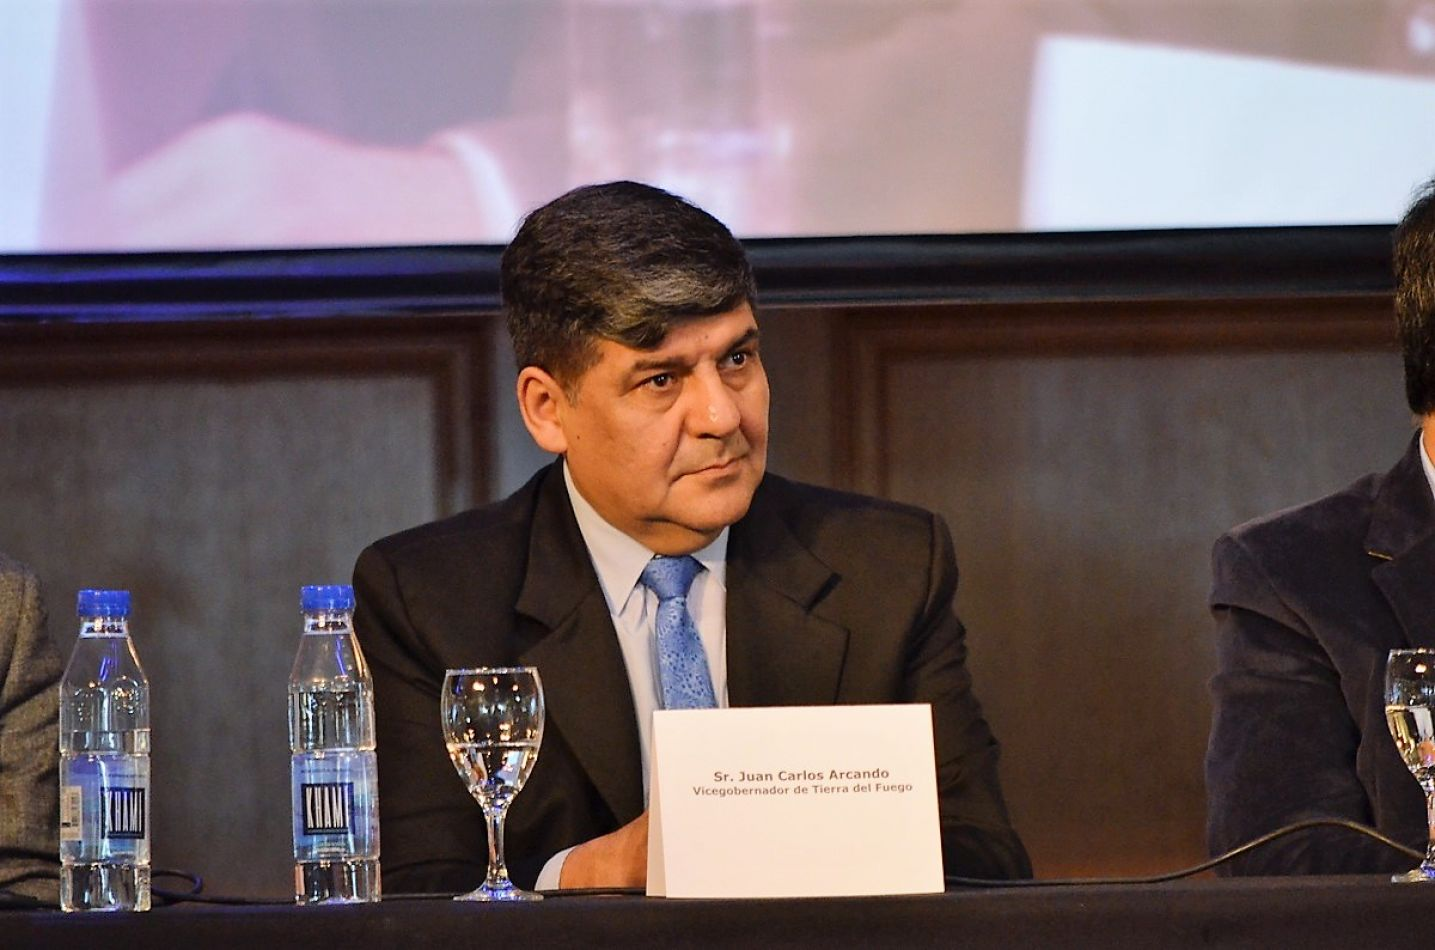 El vicegobernador Juan Carlos Arcando participó de la apertura del II Foro de la CAME.